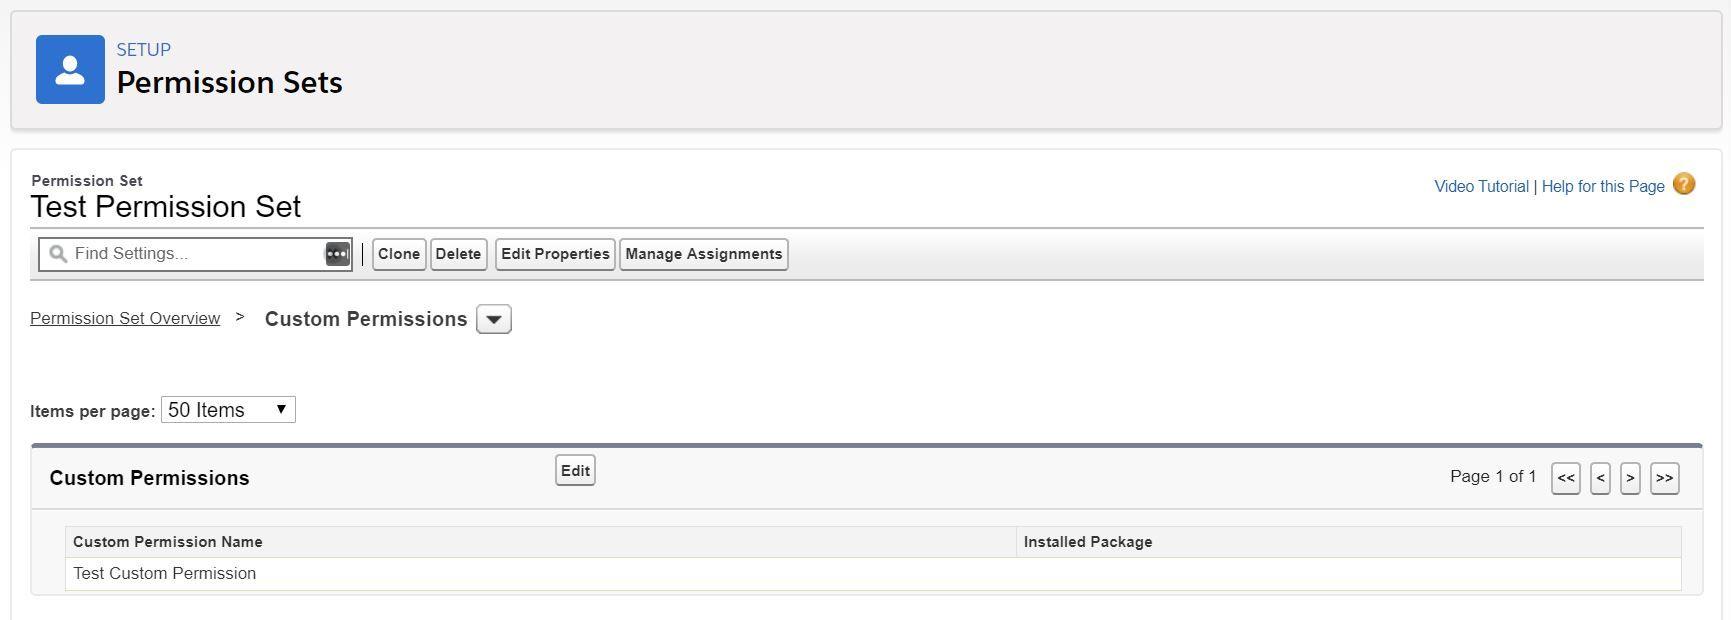 custom-permission-in-permission-sets